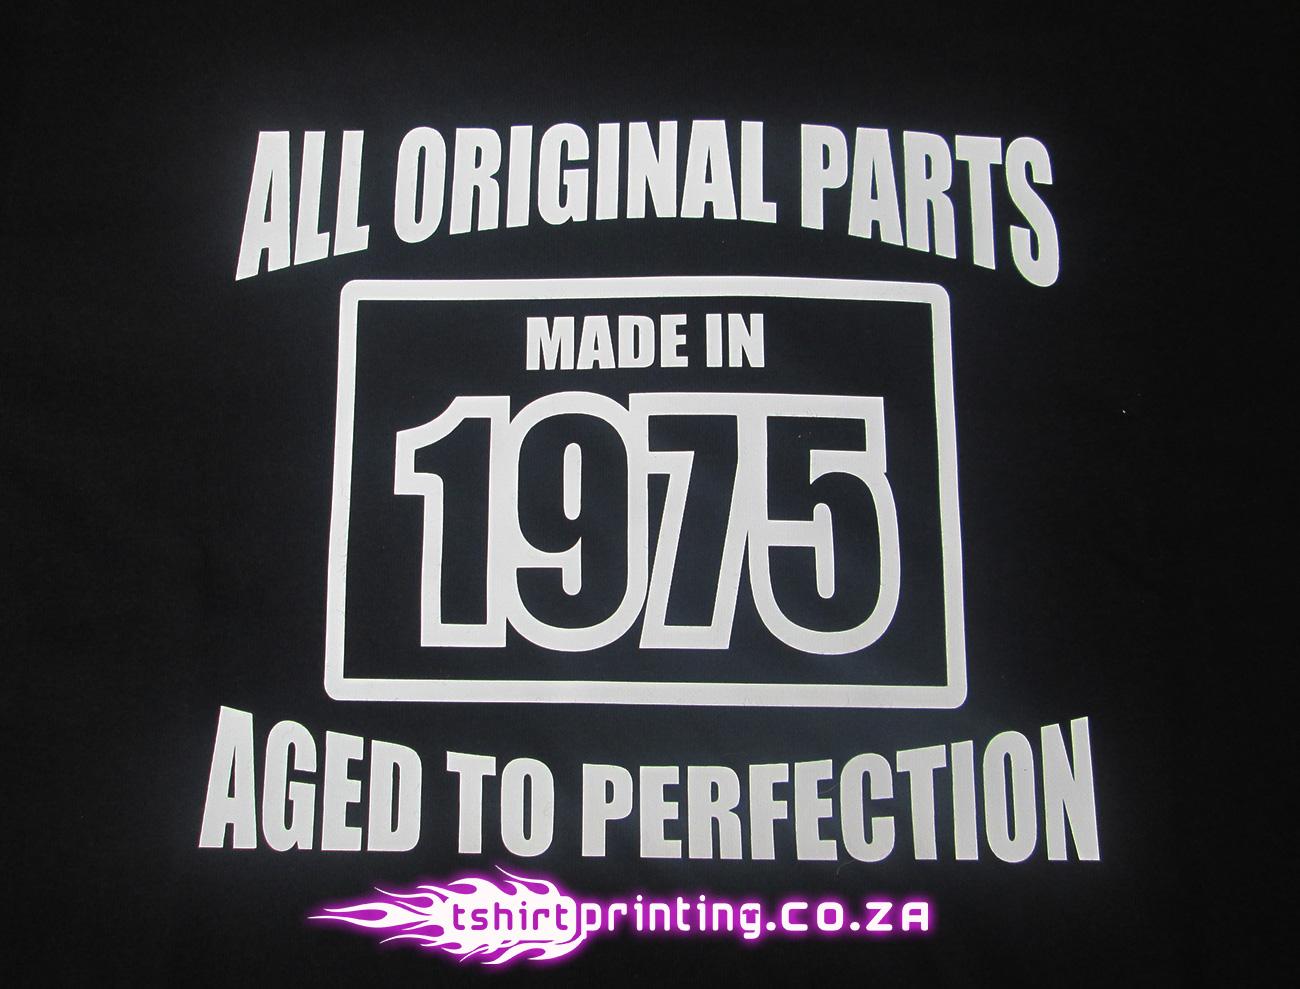 t-shirt-idea-aged-to-perfection,t-shirt-idea